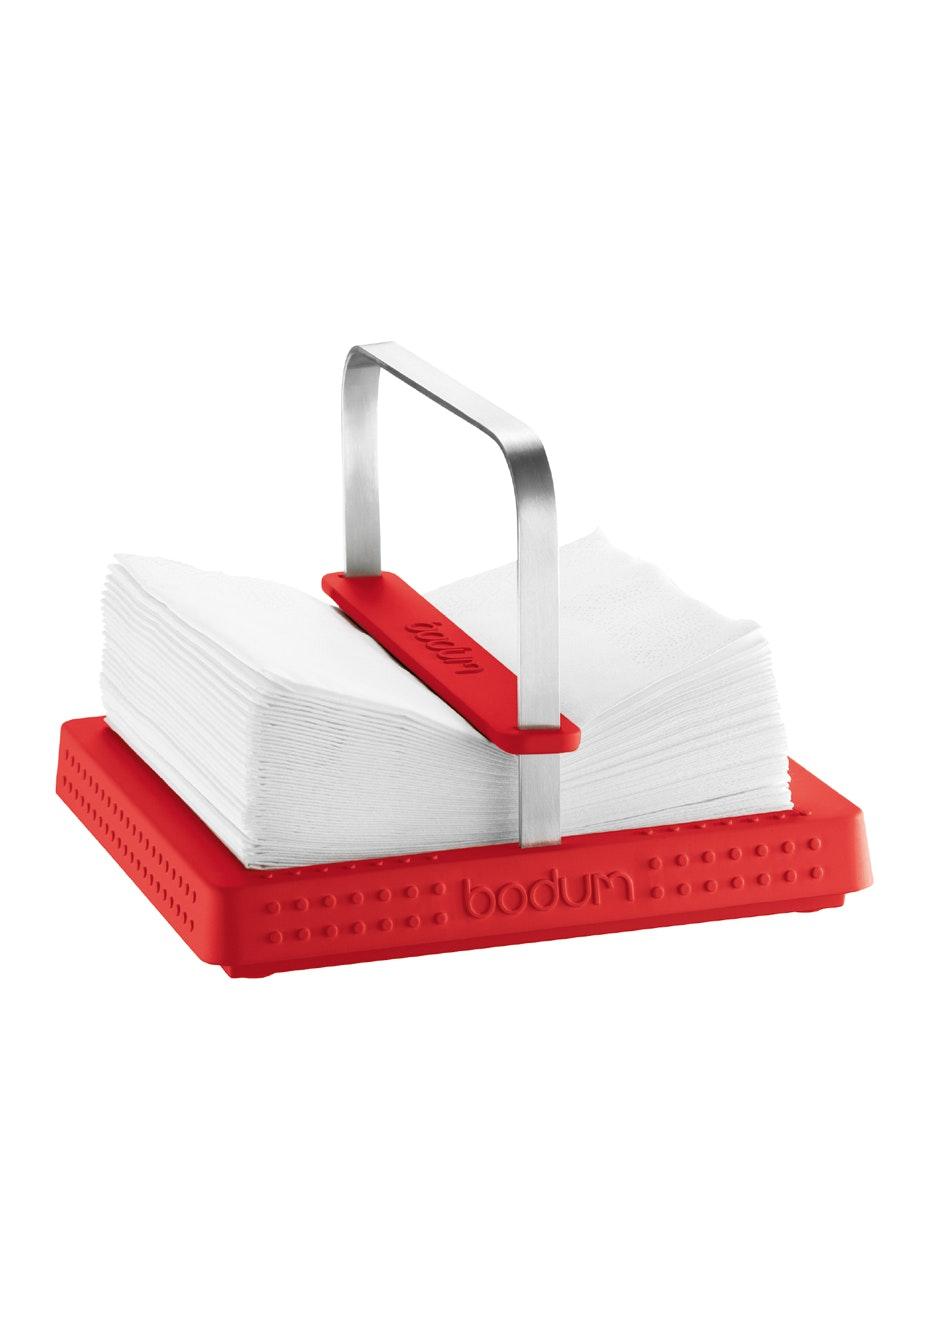 Bodum - Napkin Holder, 20 X 20 Cm - Red